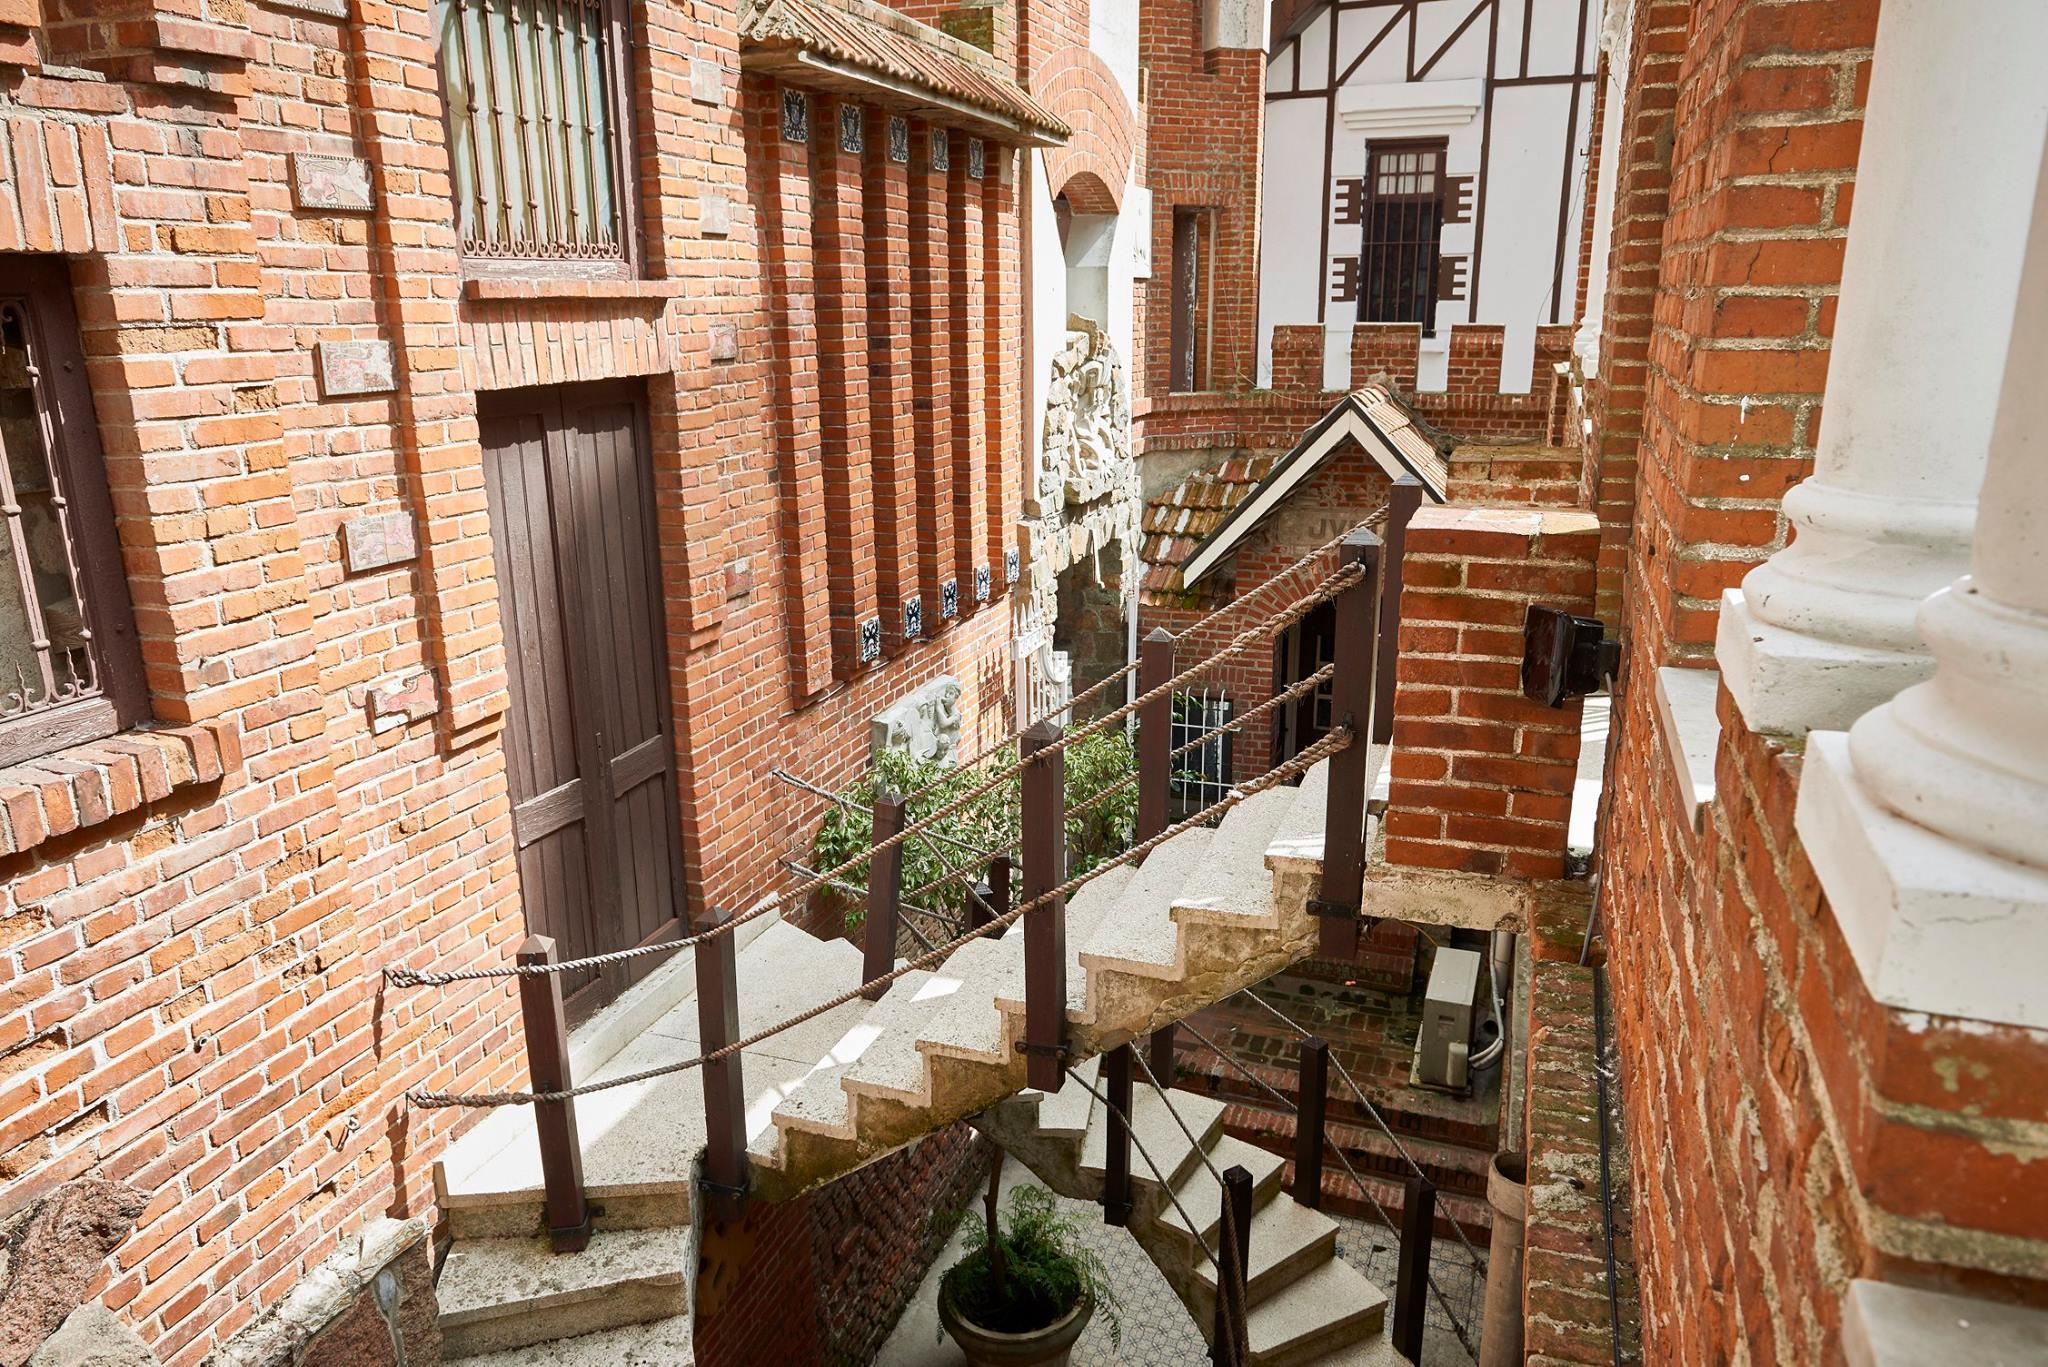 castillo-pittamiglio-em-montevideu-escada-foto-facebook-oficial